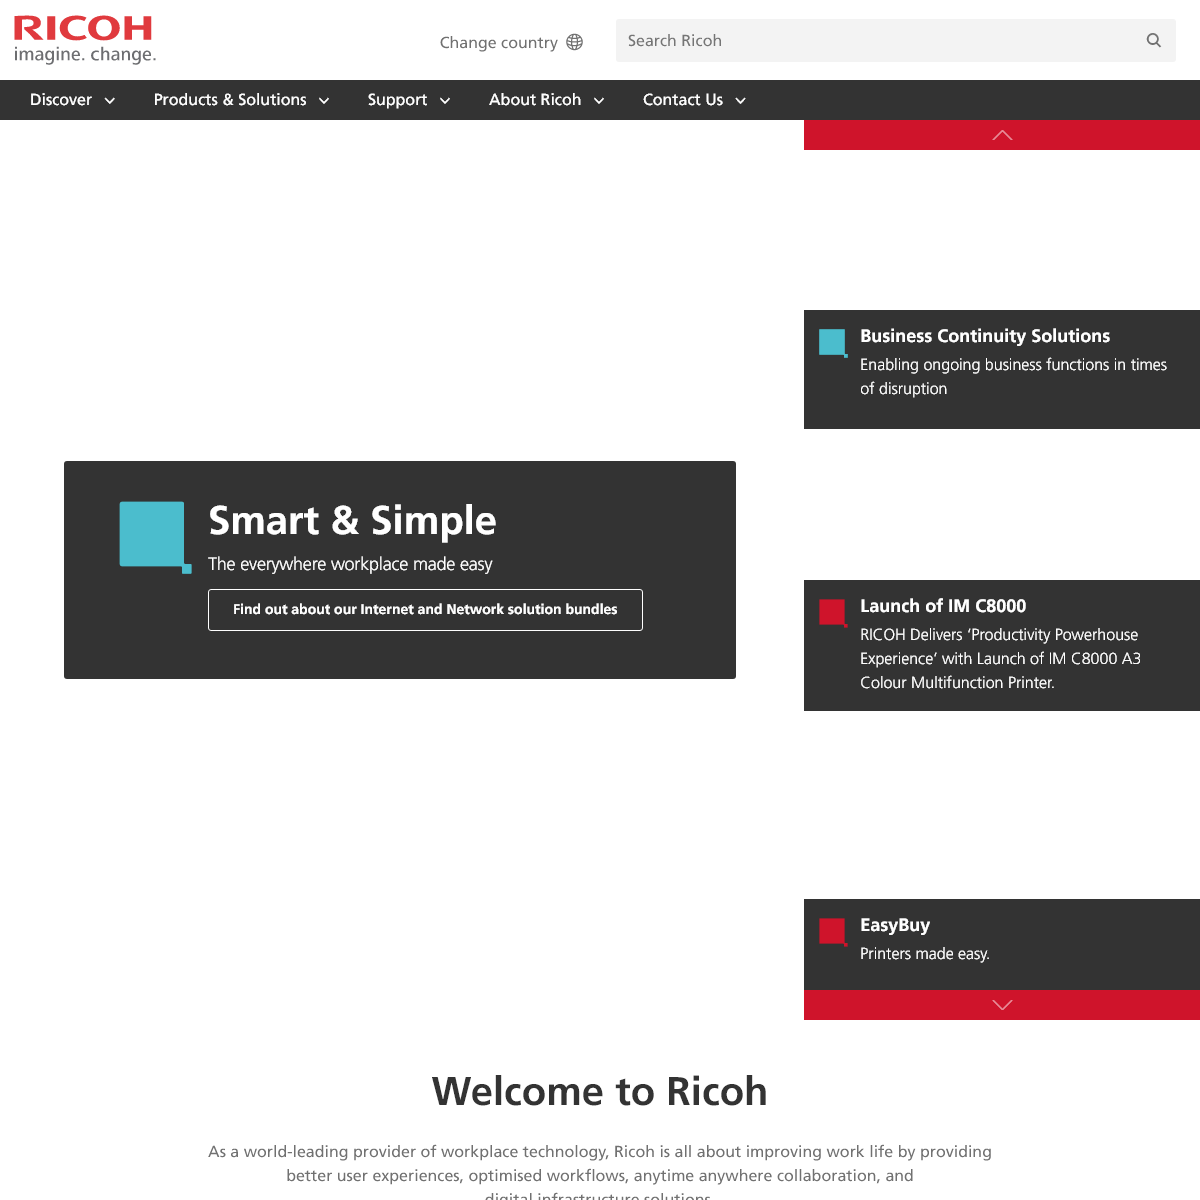 Ricoh Australia - Empowering Digital Workplaces